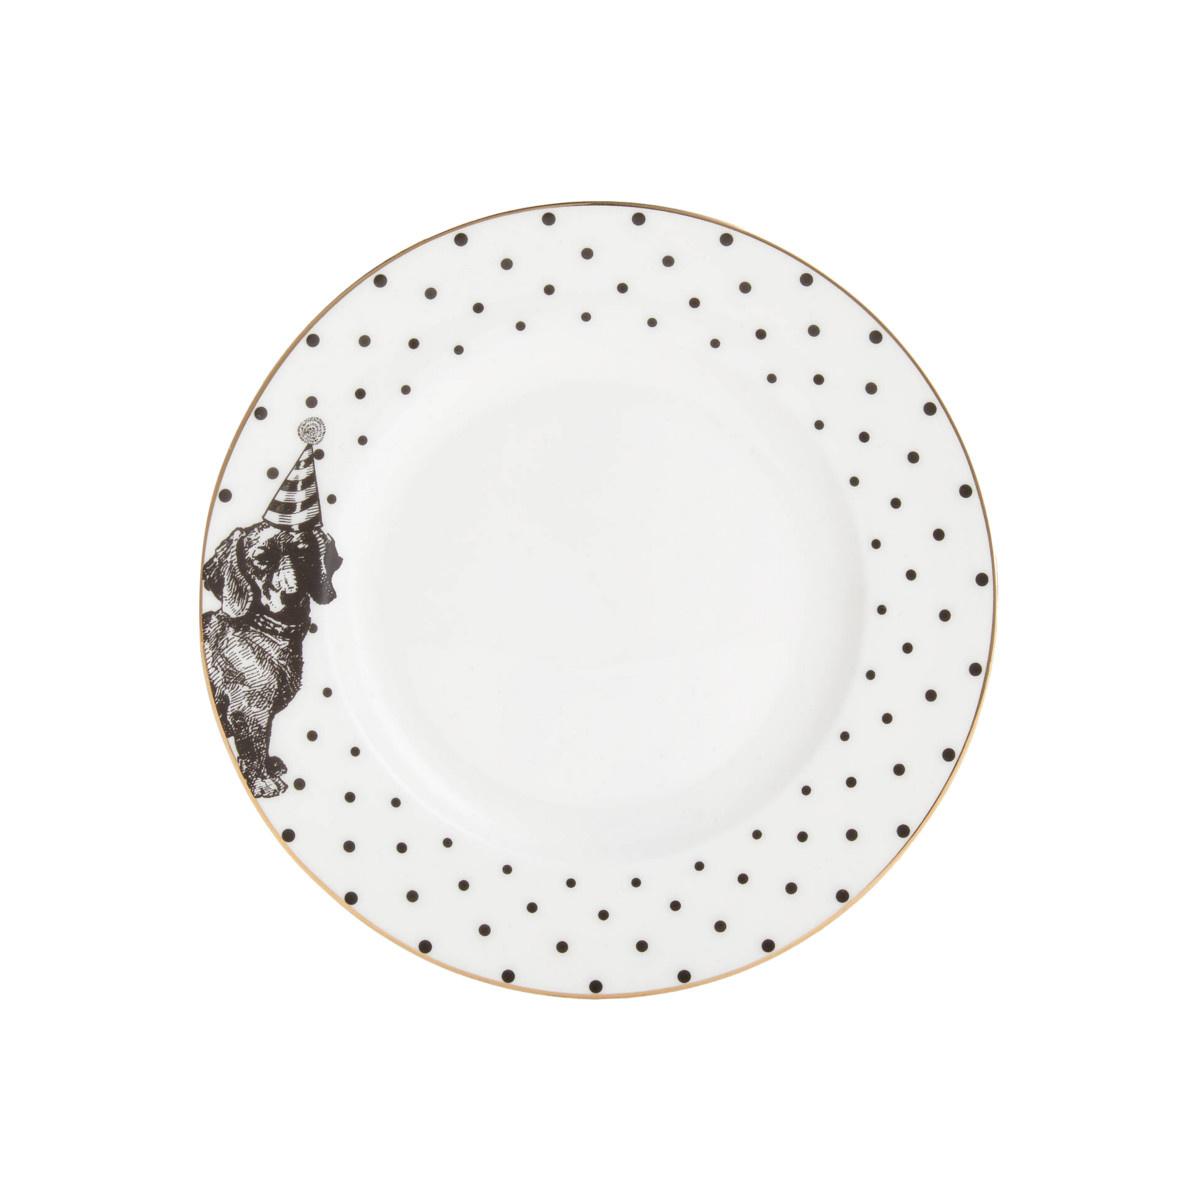 Yvonne Ellen Yvonne Ellen London Monochrome Set of 2 Plates Ø 16 cm - Sausage Dog - Bone China